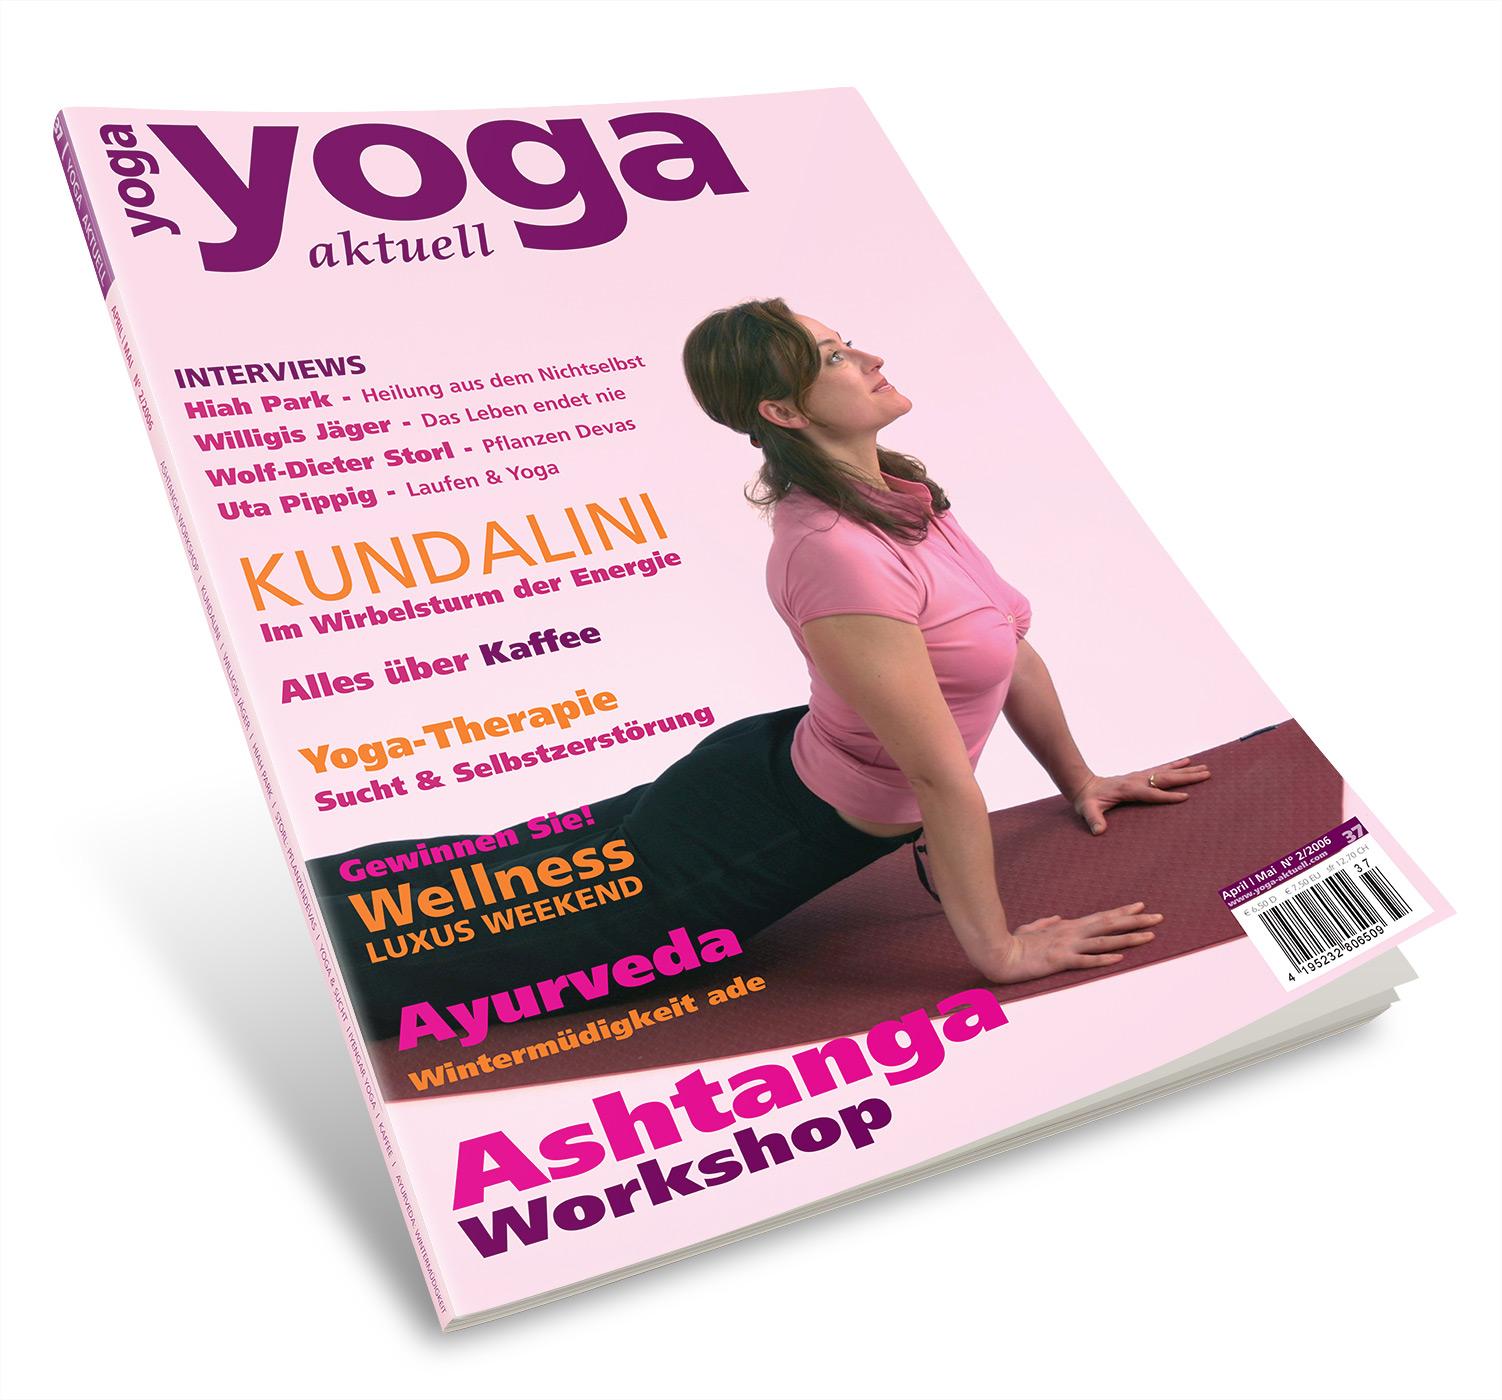 Yoga Aktuell 37 - 02/2006